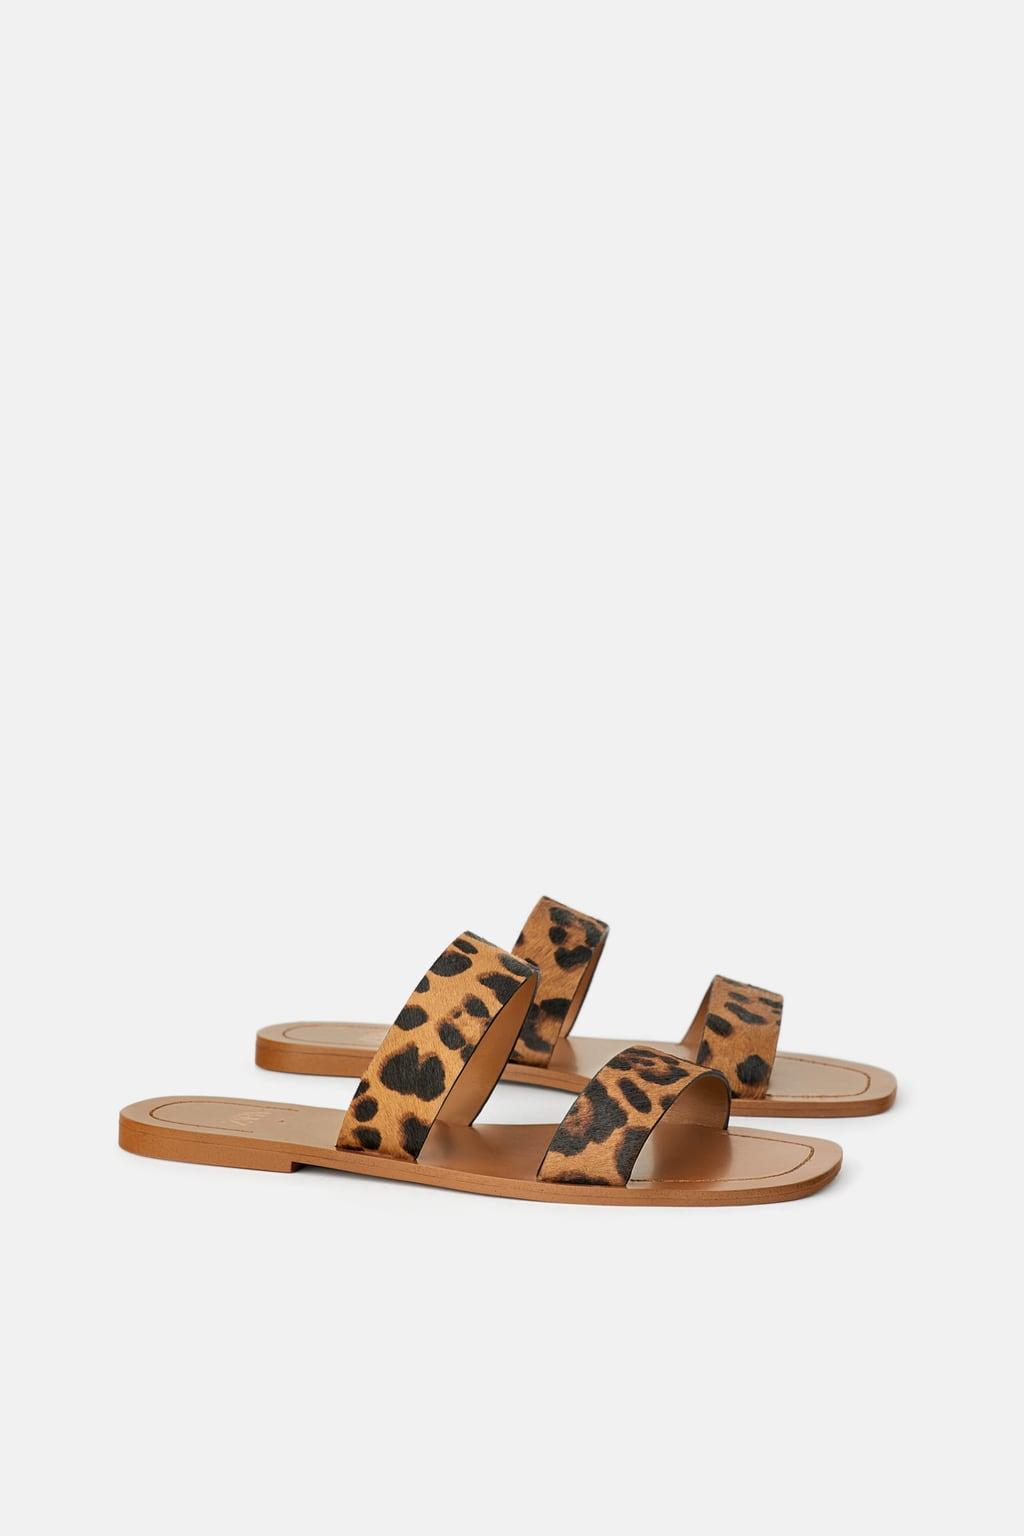 Leopard sandals_Zara.jpg